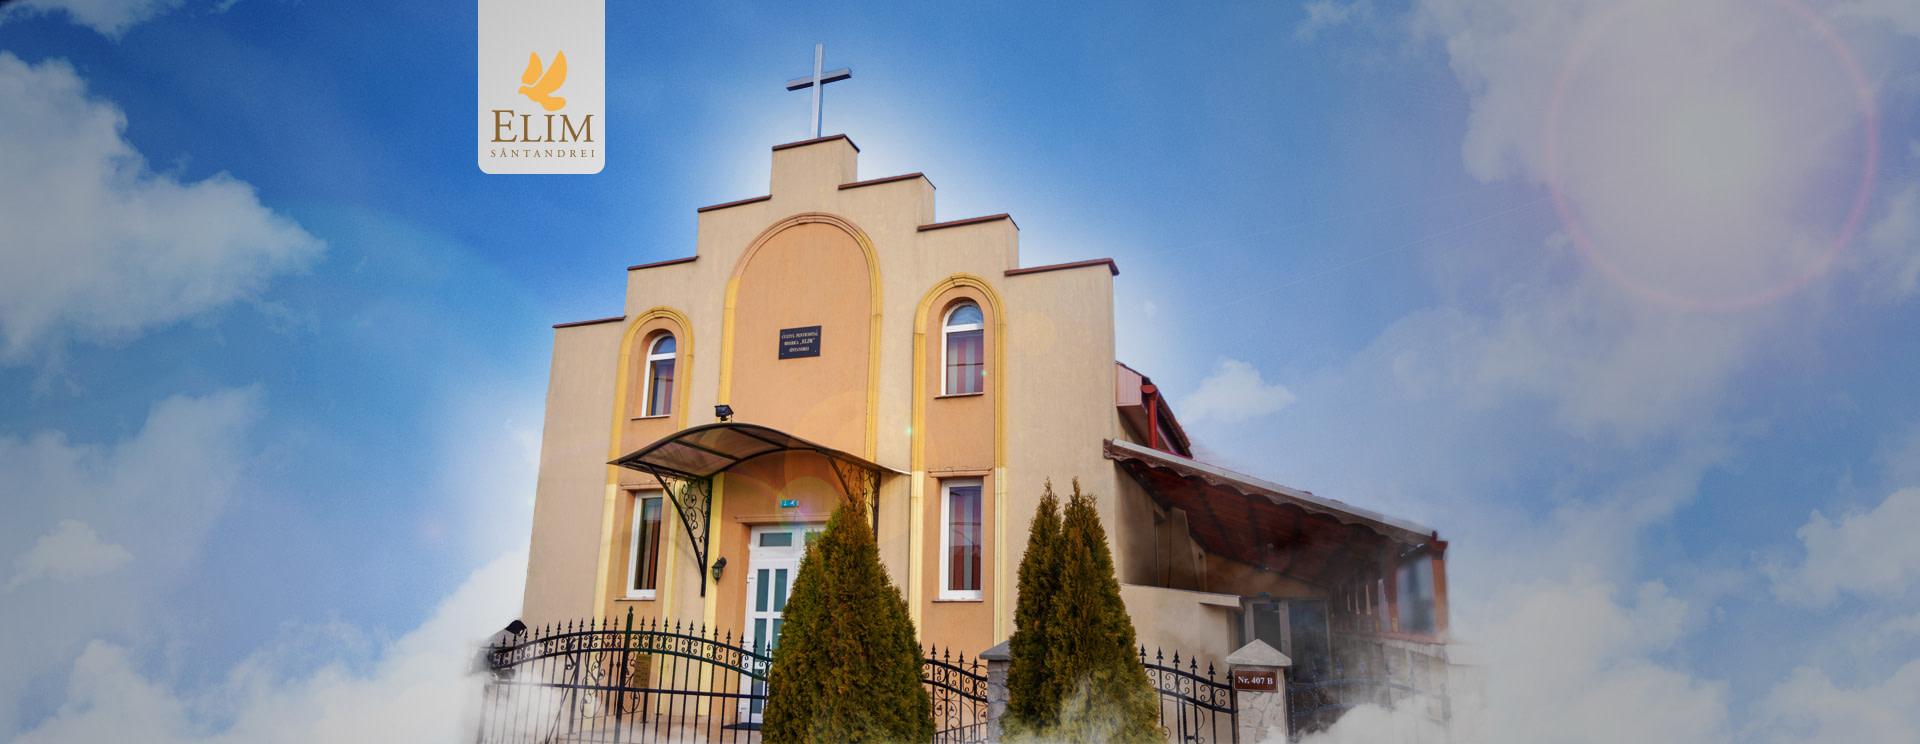 Biserica Elim Sântandrei, exterior